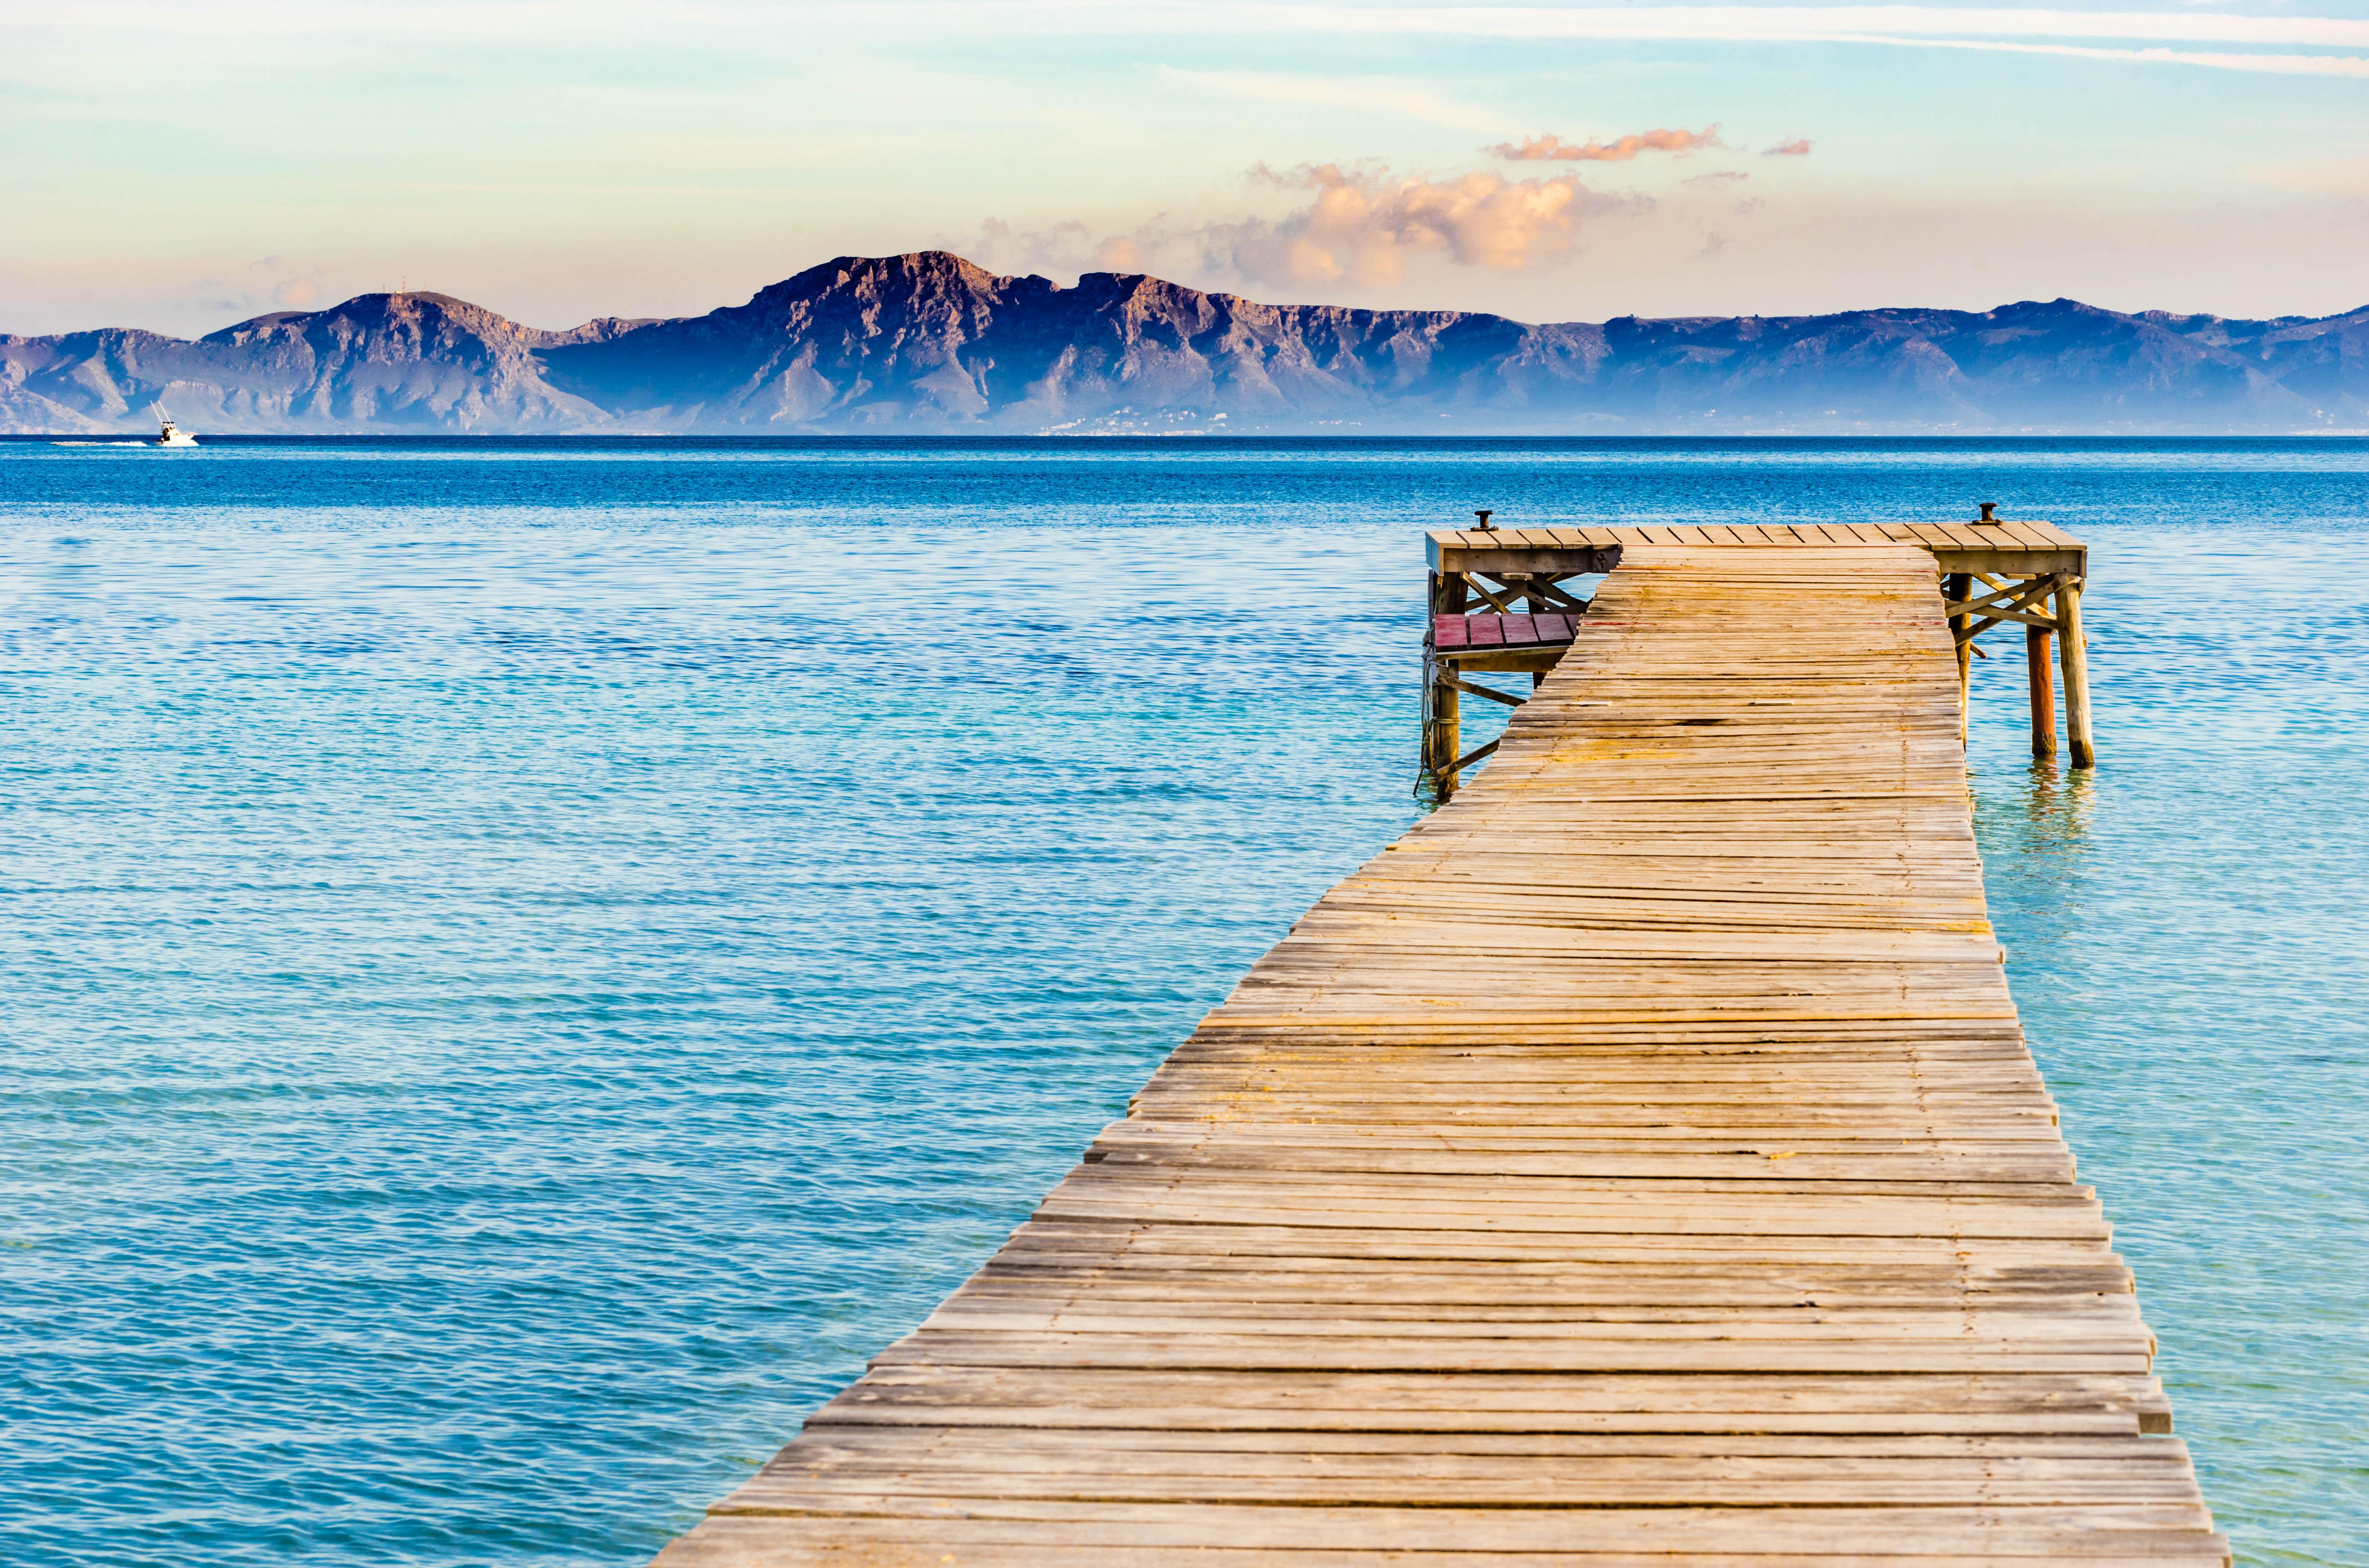 Alcudia das urlaubsparadies im norden von mallorca for Design hotel mallorca strand